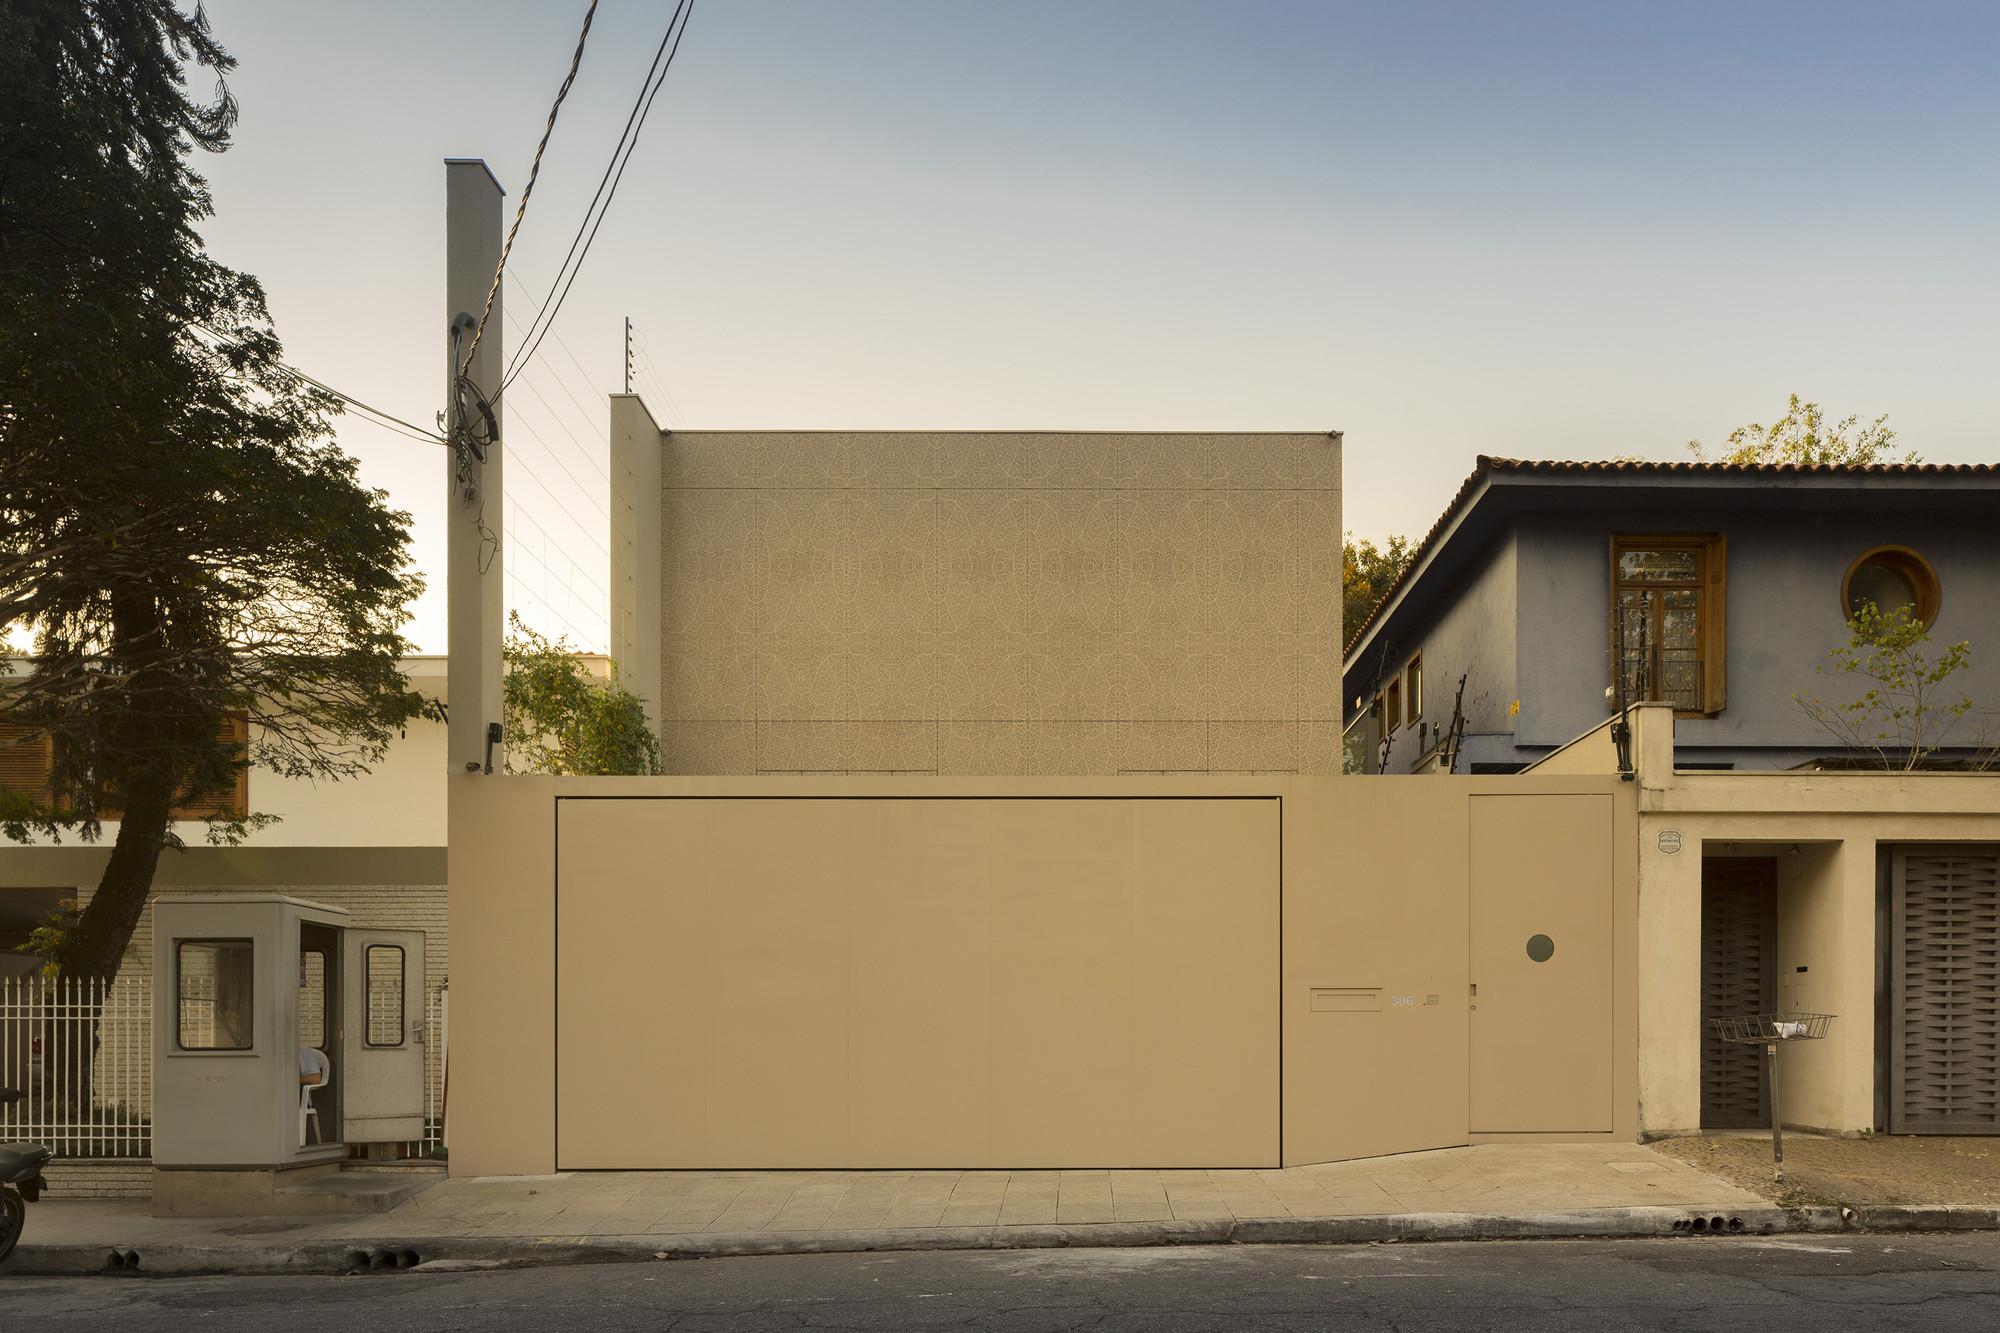 Galeria de casa k studio arthur casas 12 - Ceramica para fachadas casas ...